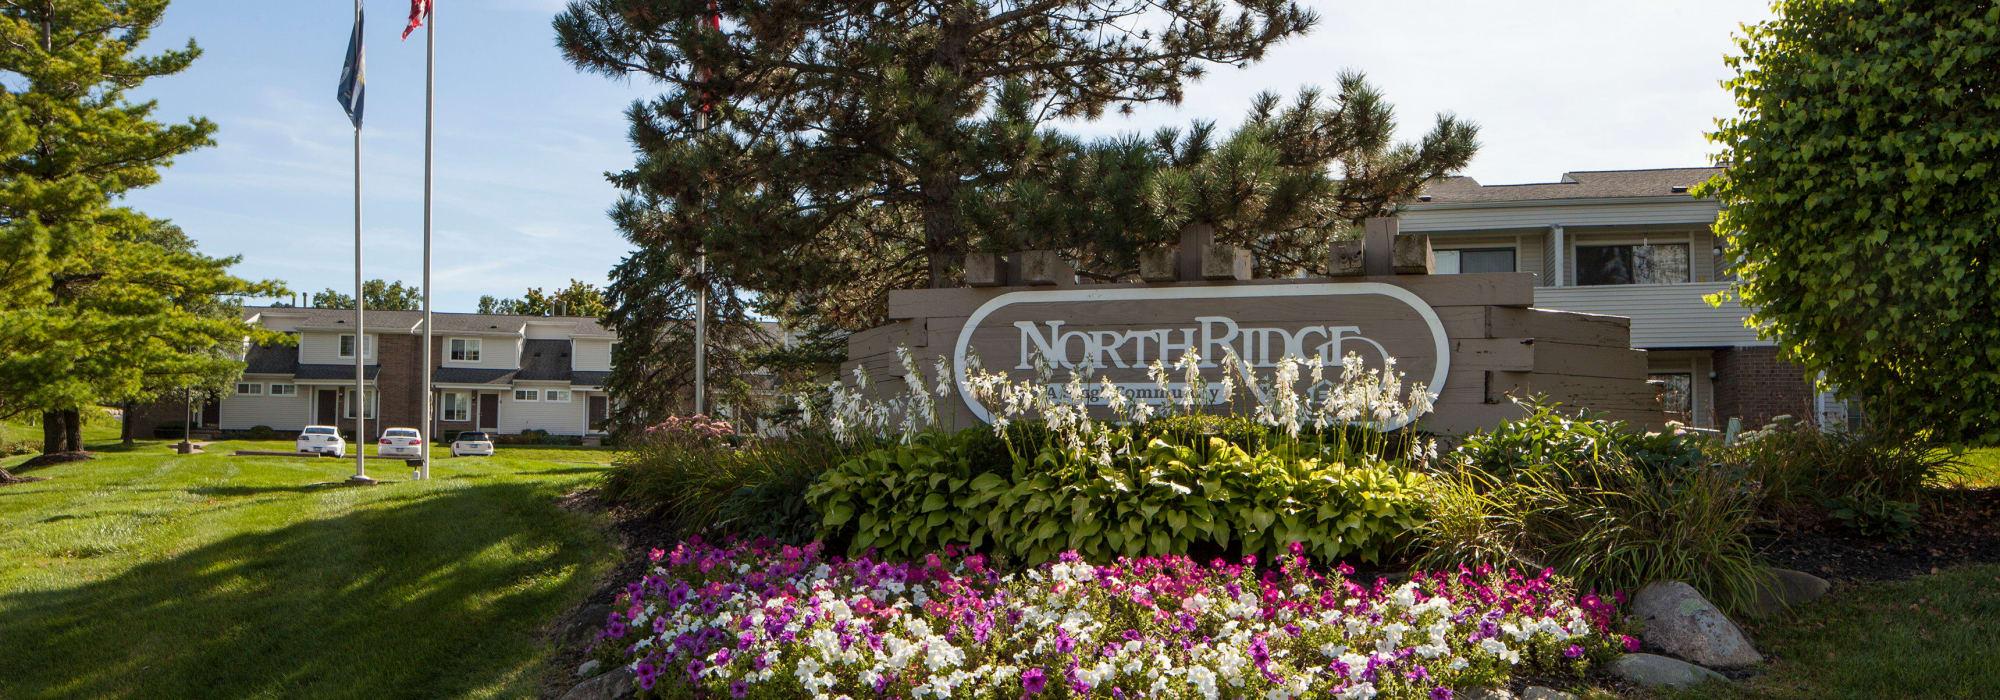 rochester hills, mi apartments for rent | northridge